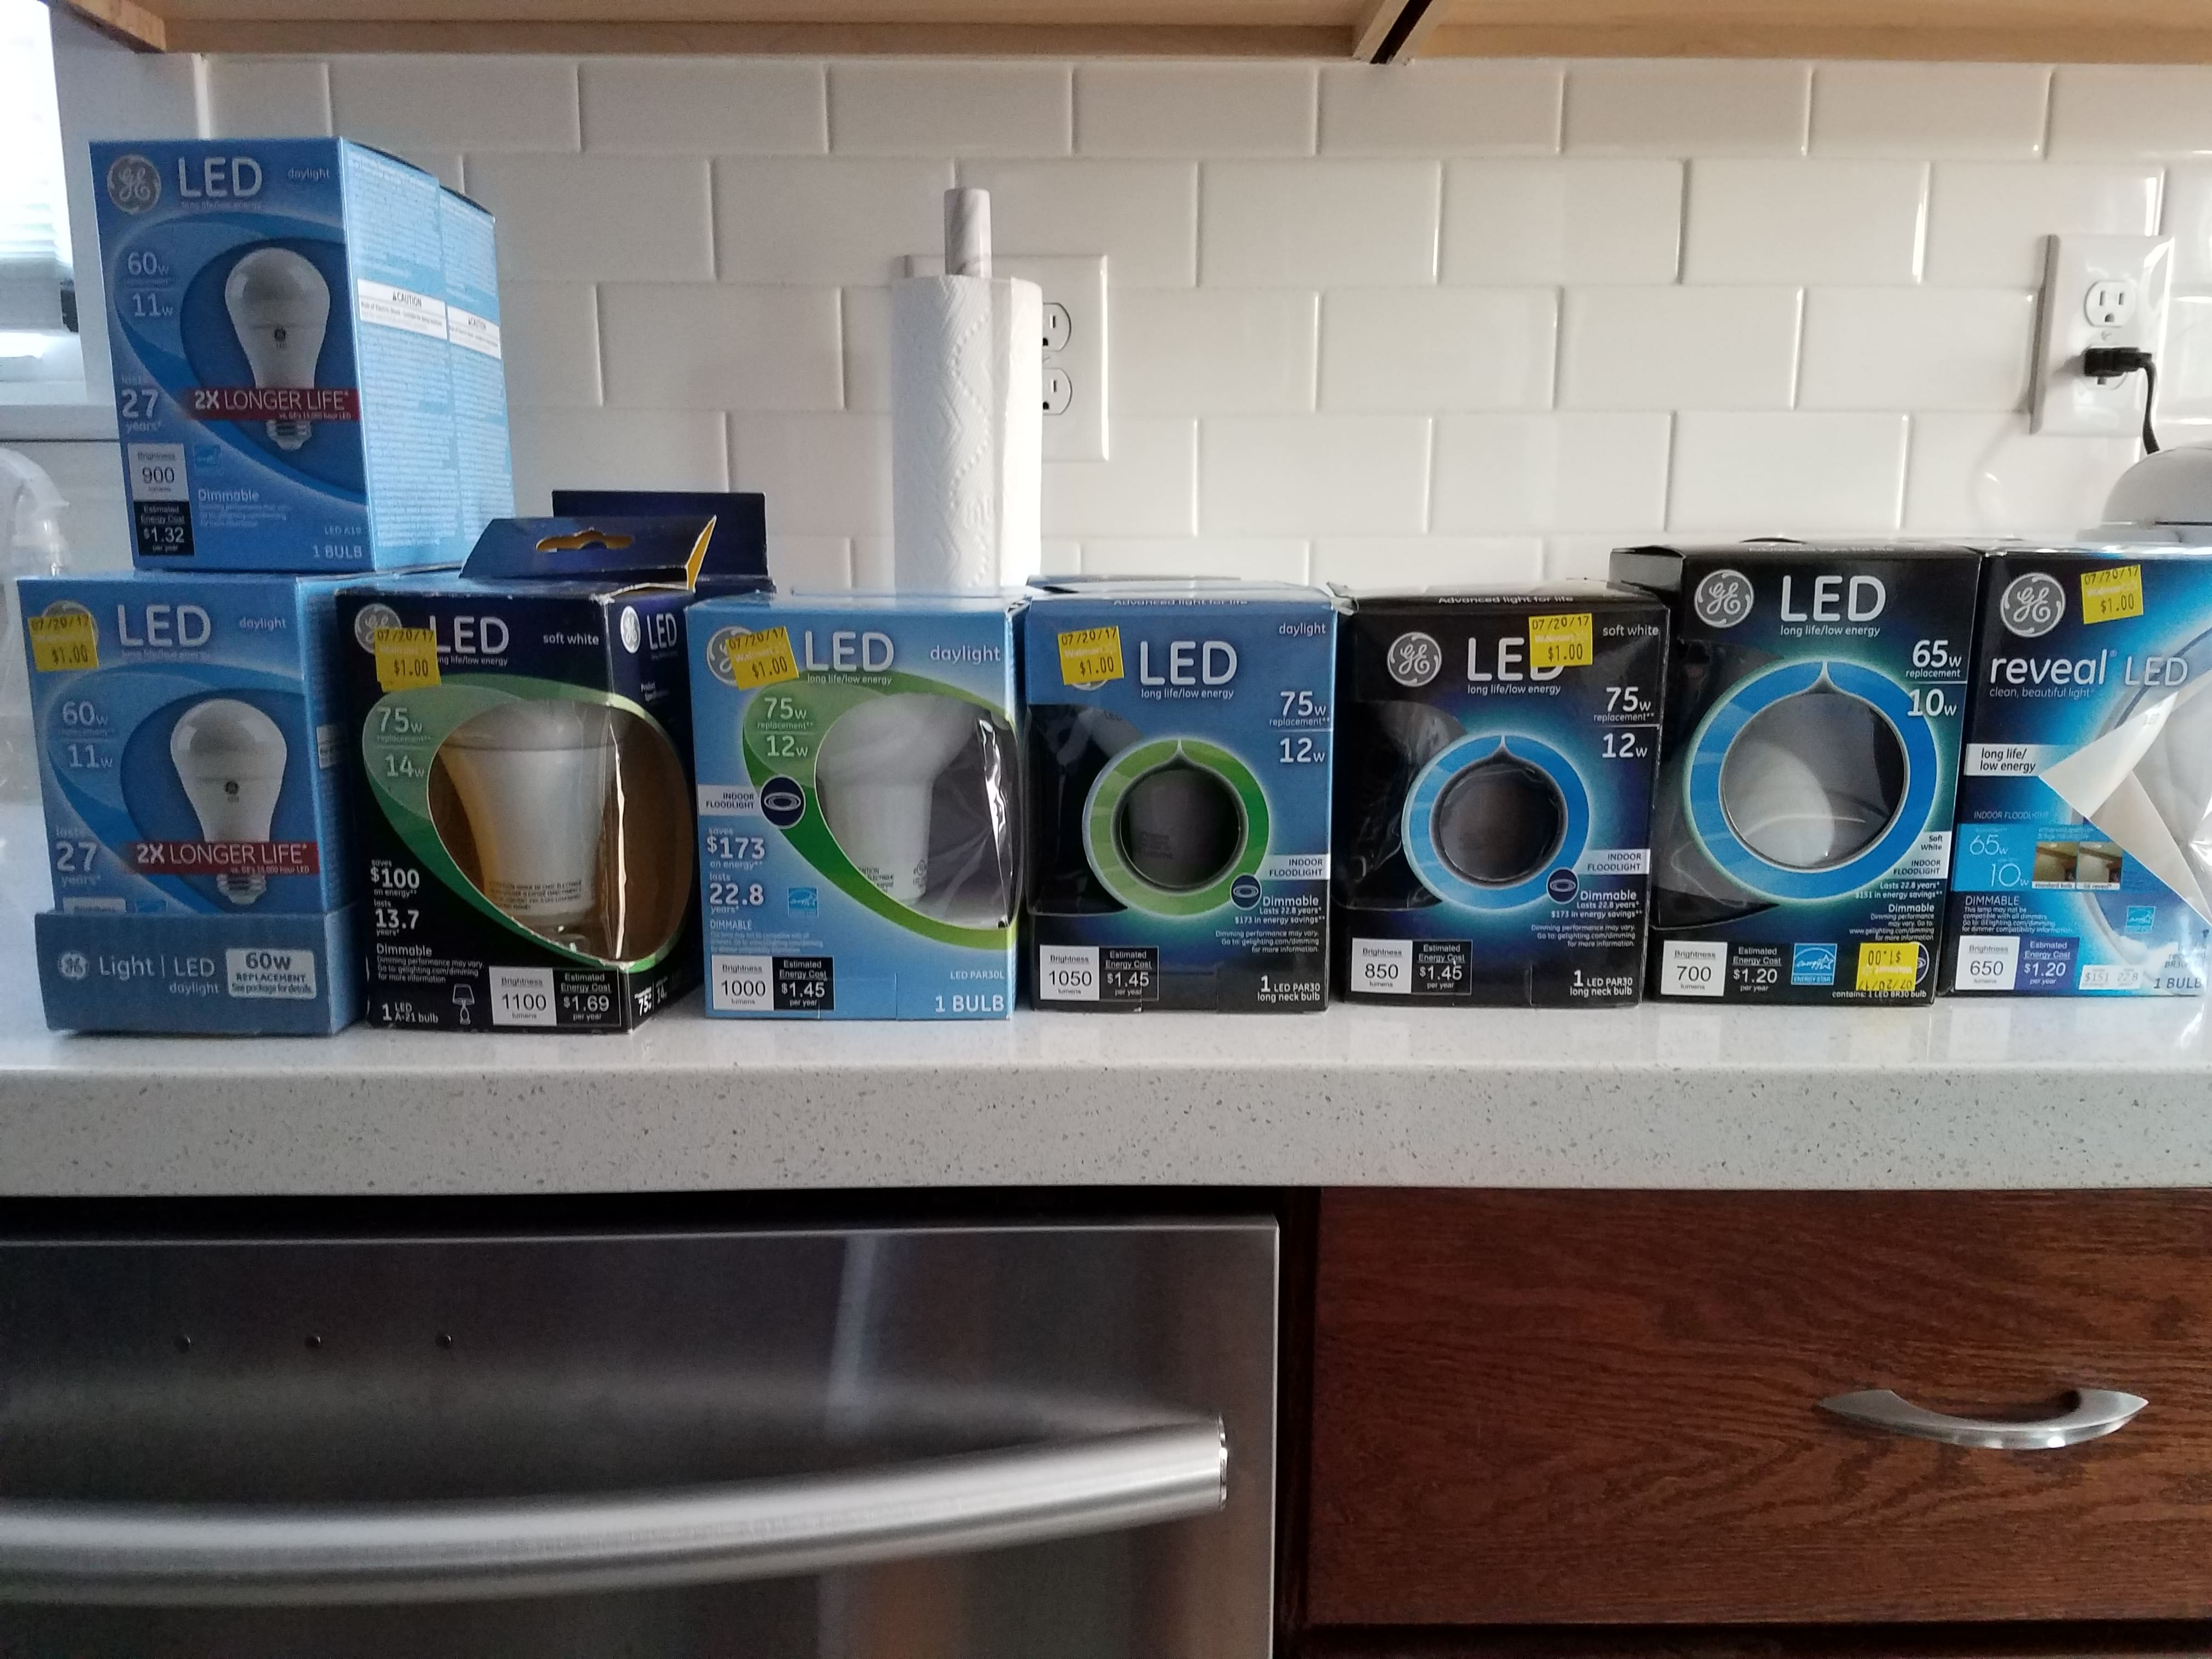 Walmart Clearance LED Lightbulbs $1 - YMMV